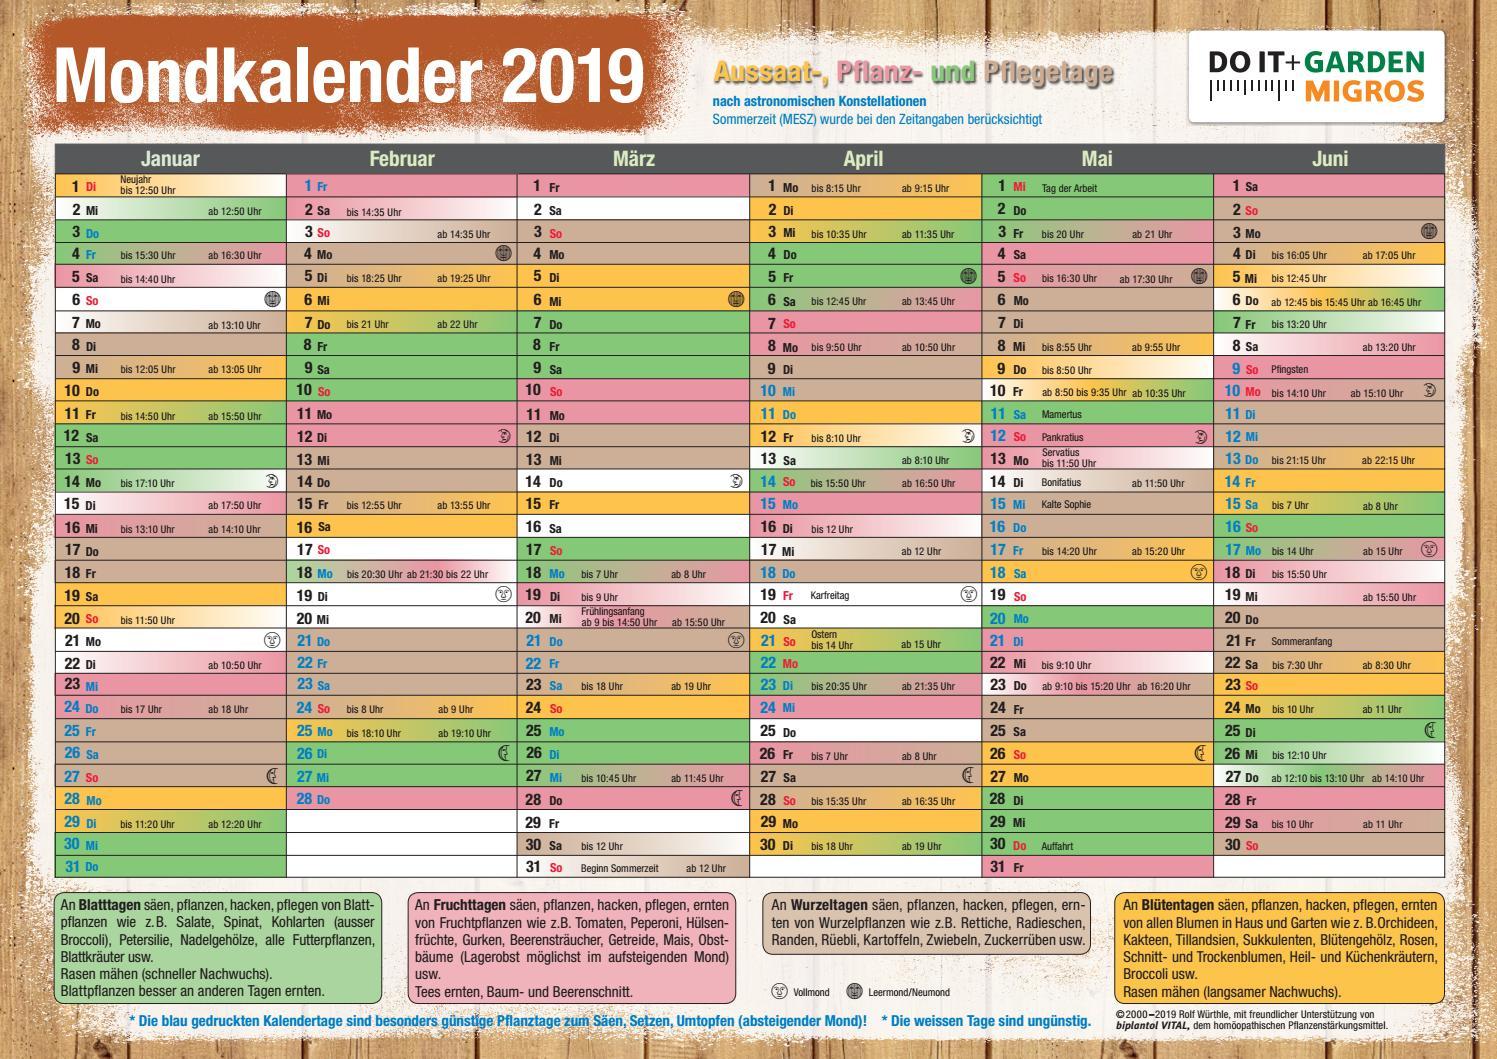 Mondkalender haare schneiden april 2020